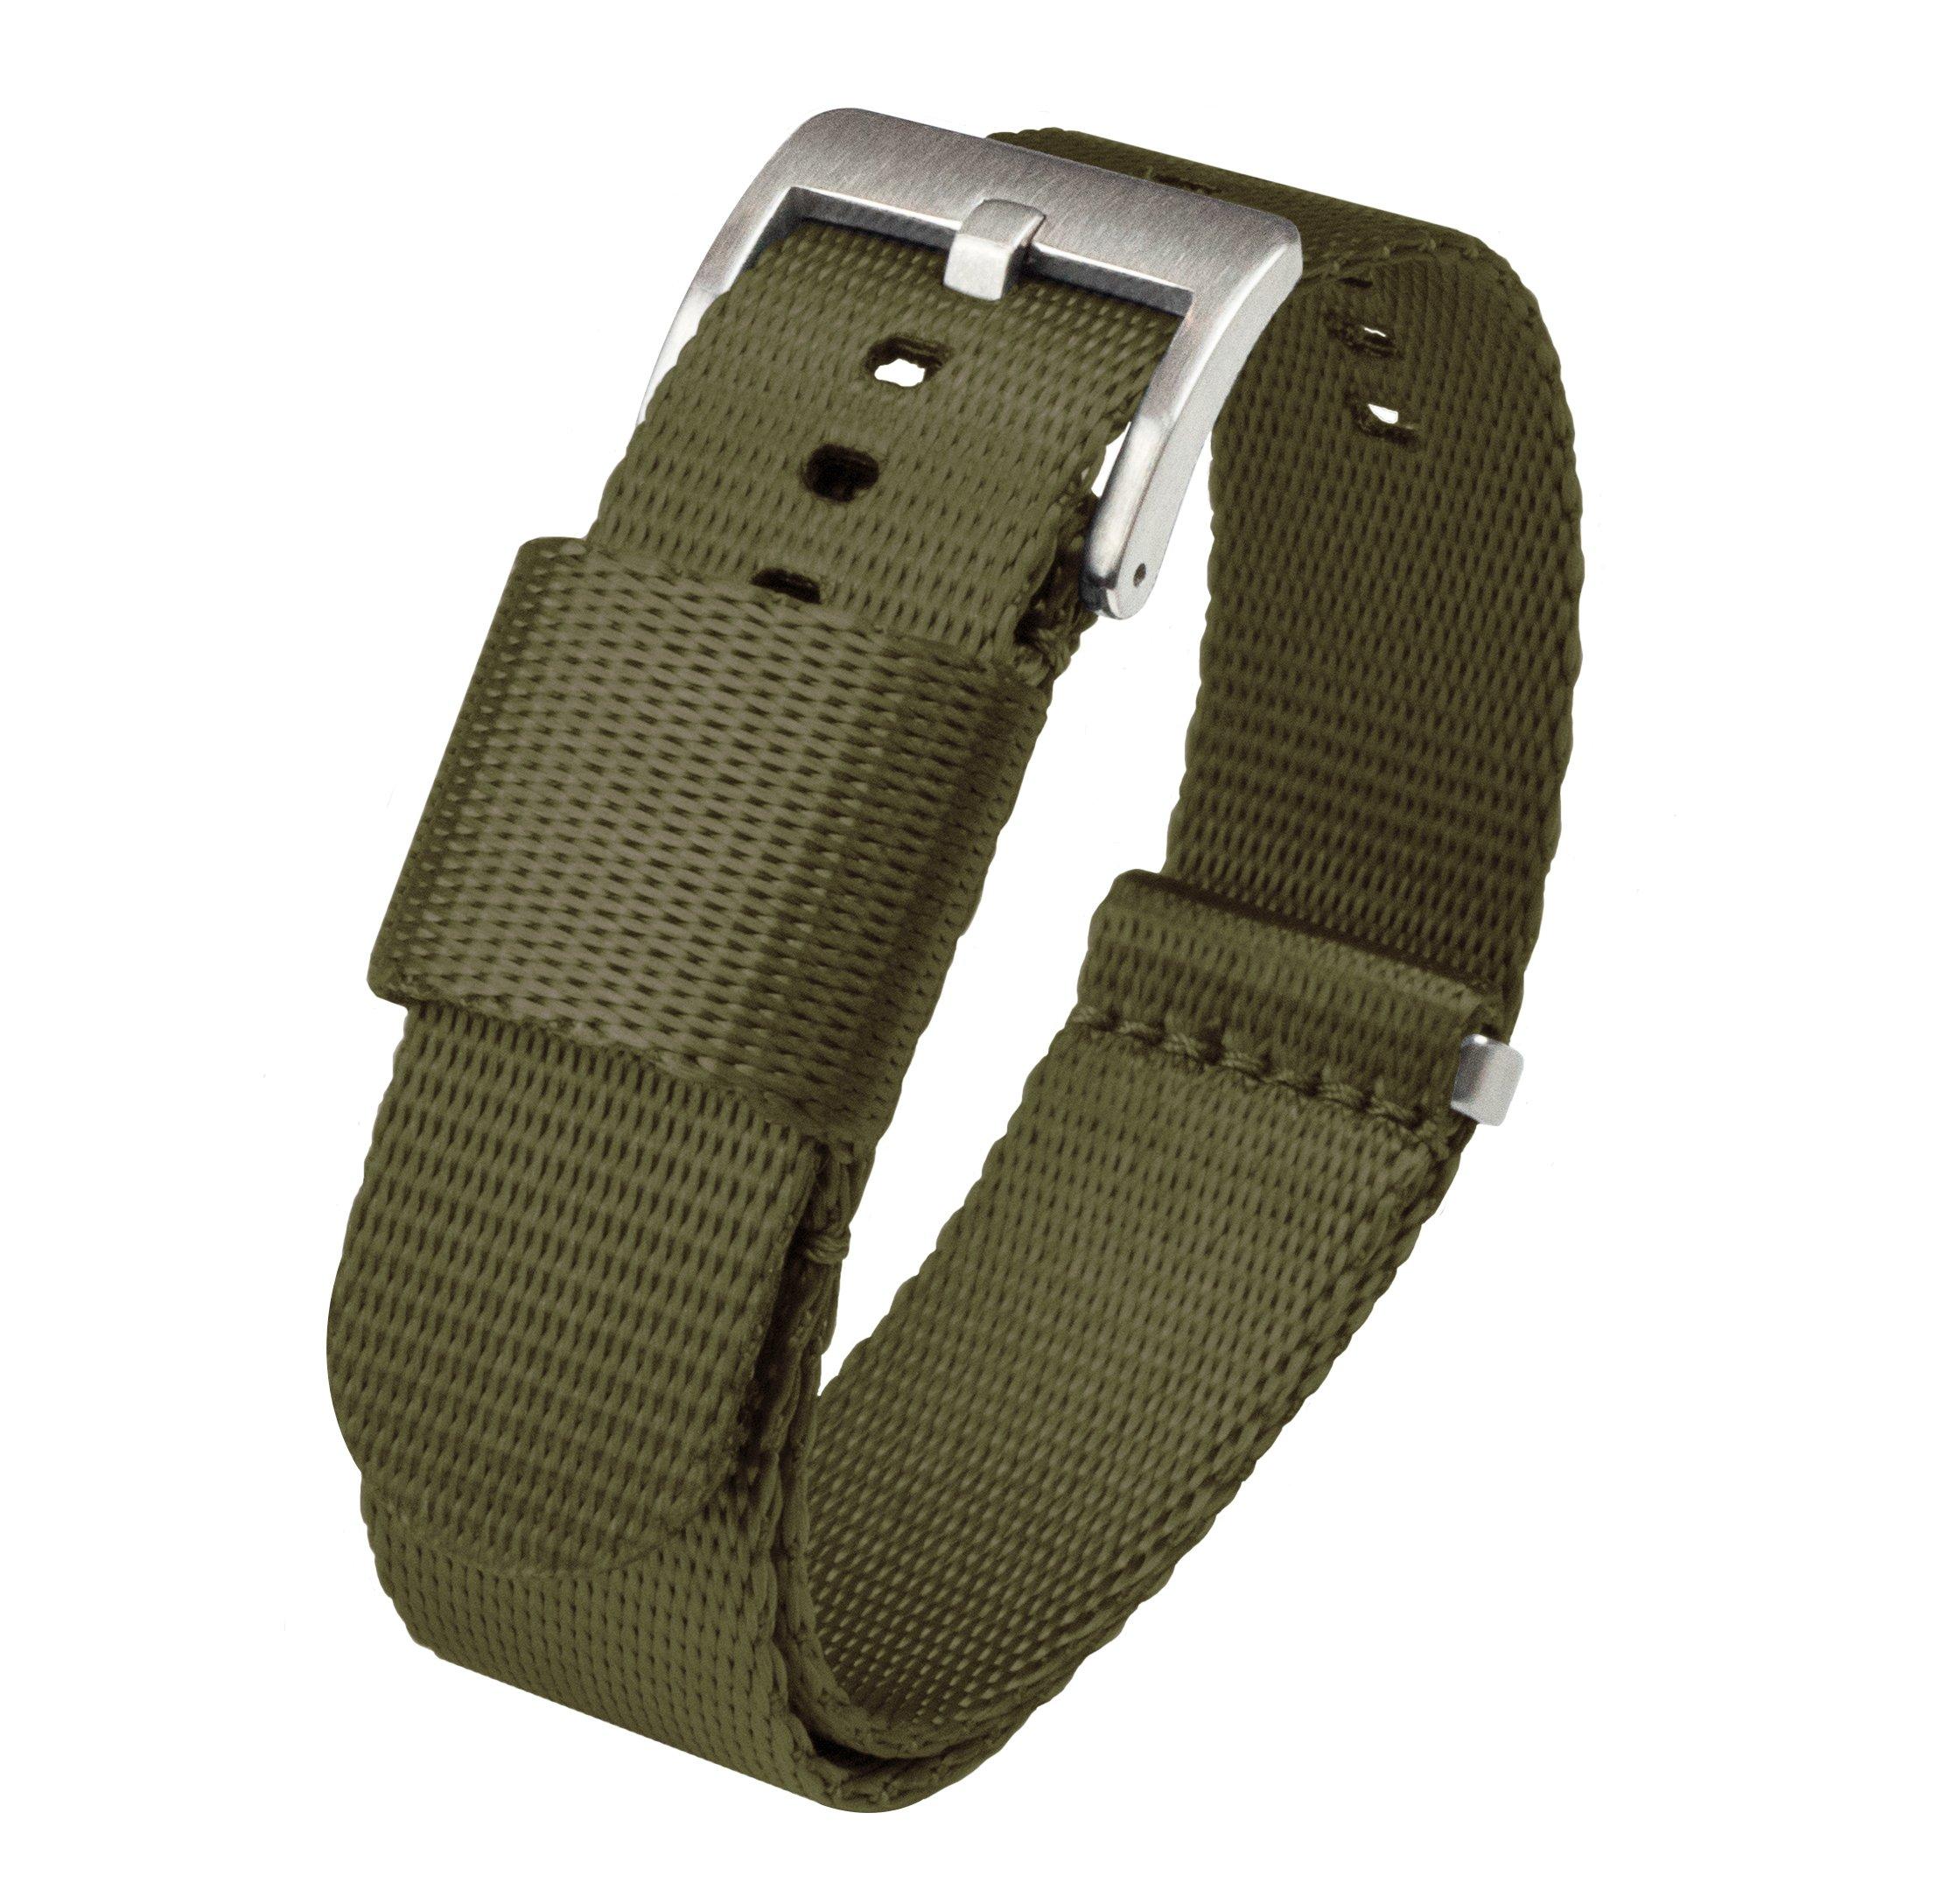 Barton Jetson NATO Style Watch Strap - 18mm 20mm 22mm or 24mm - Seat Belt Nylon Watch Bands